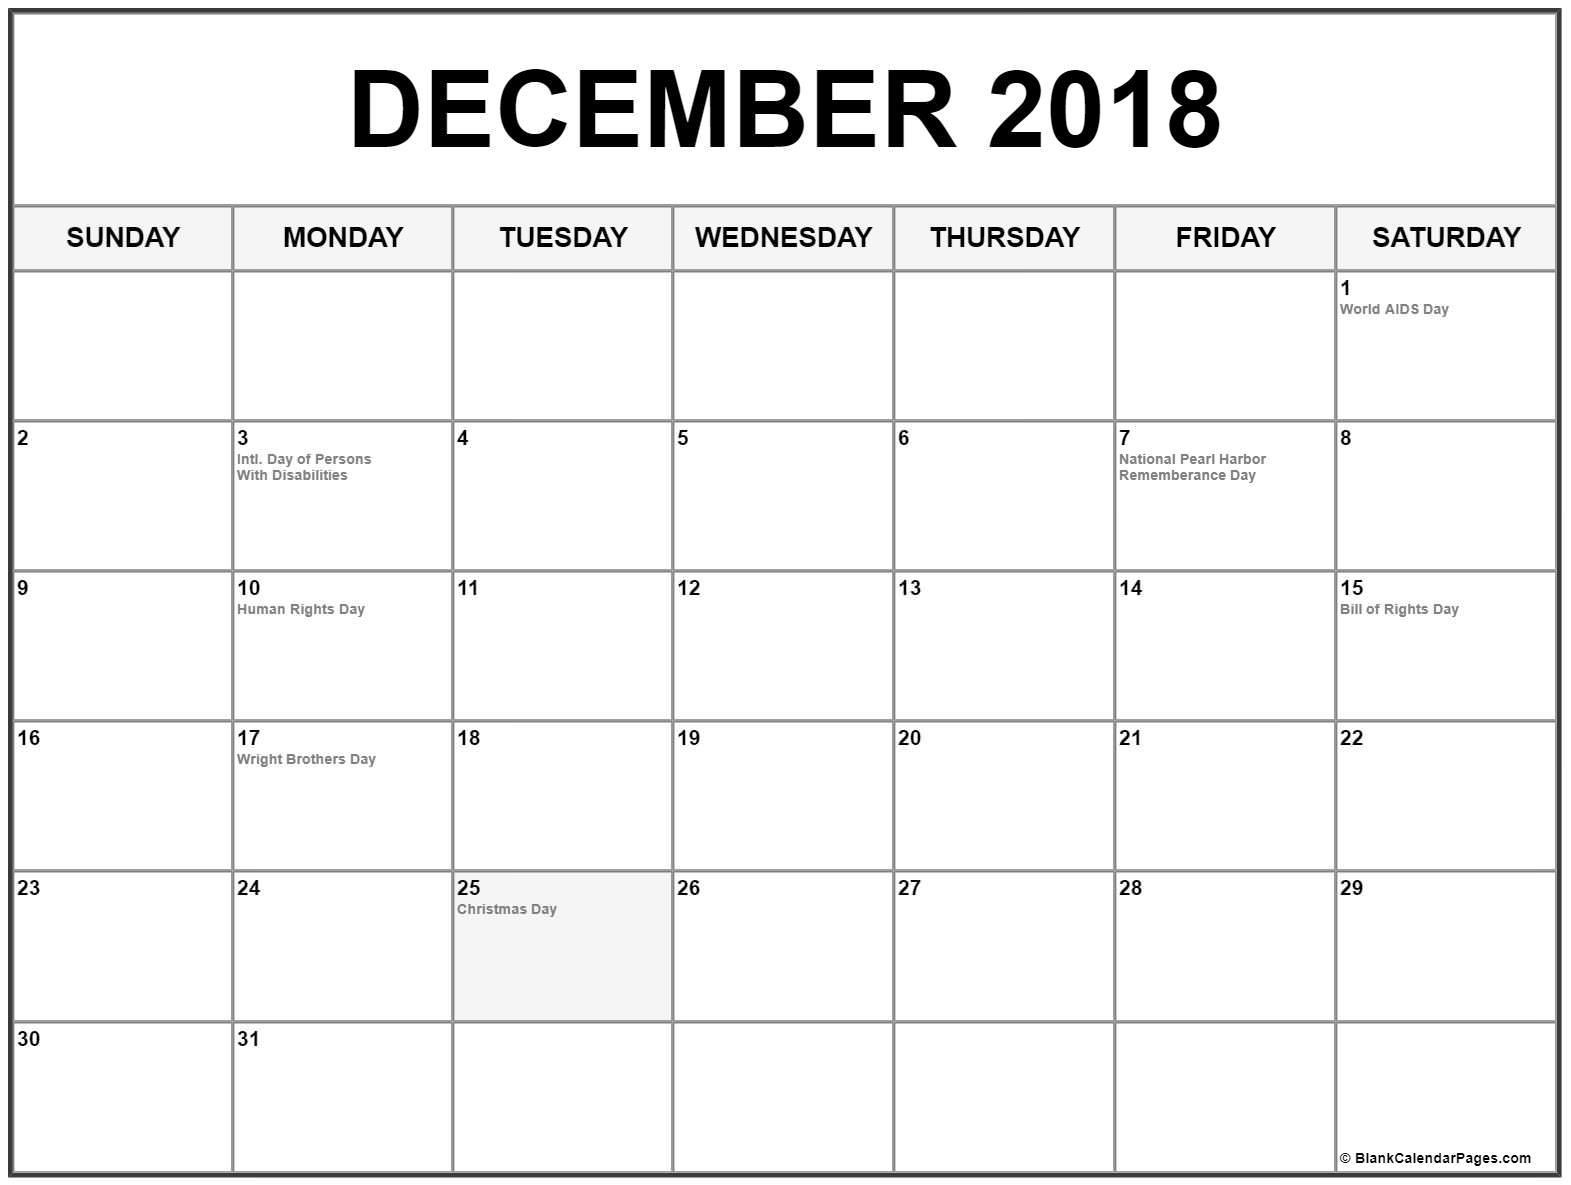 December 2018 Holidays Calendar